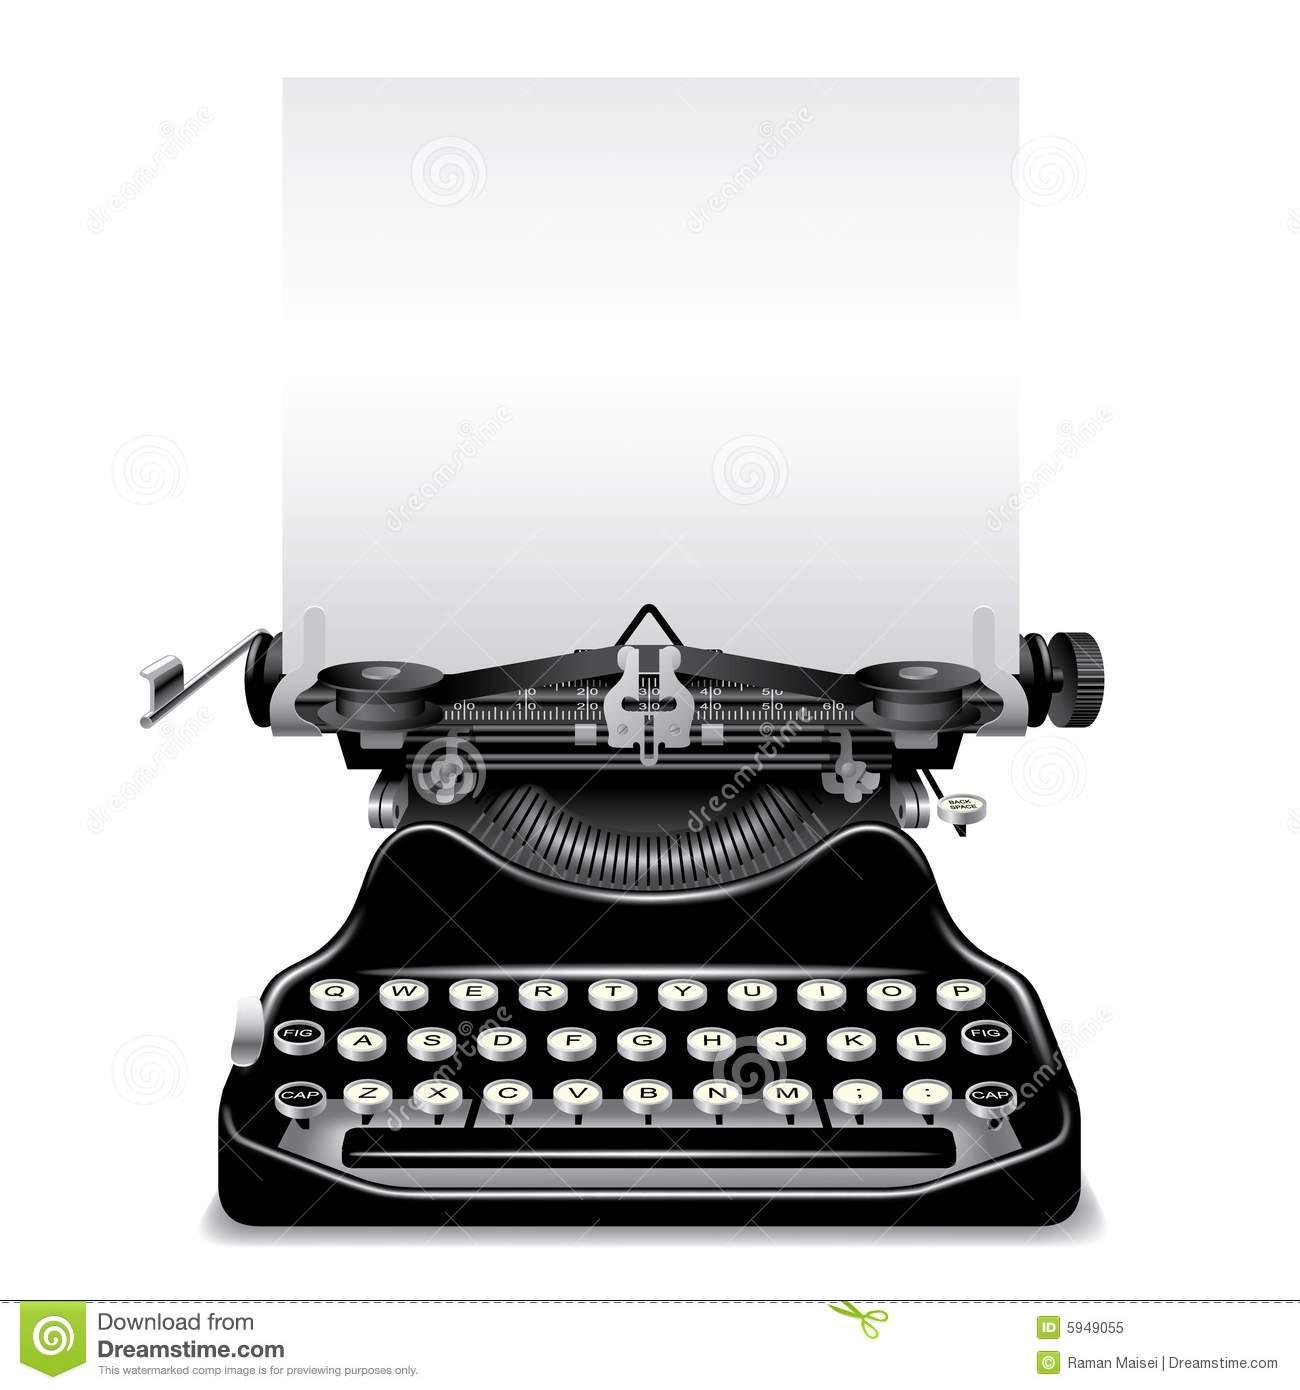 Typewriter Stock Illustrations.